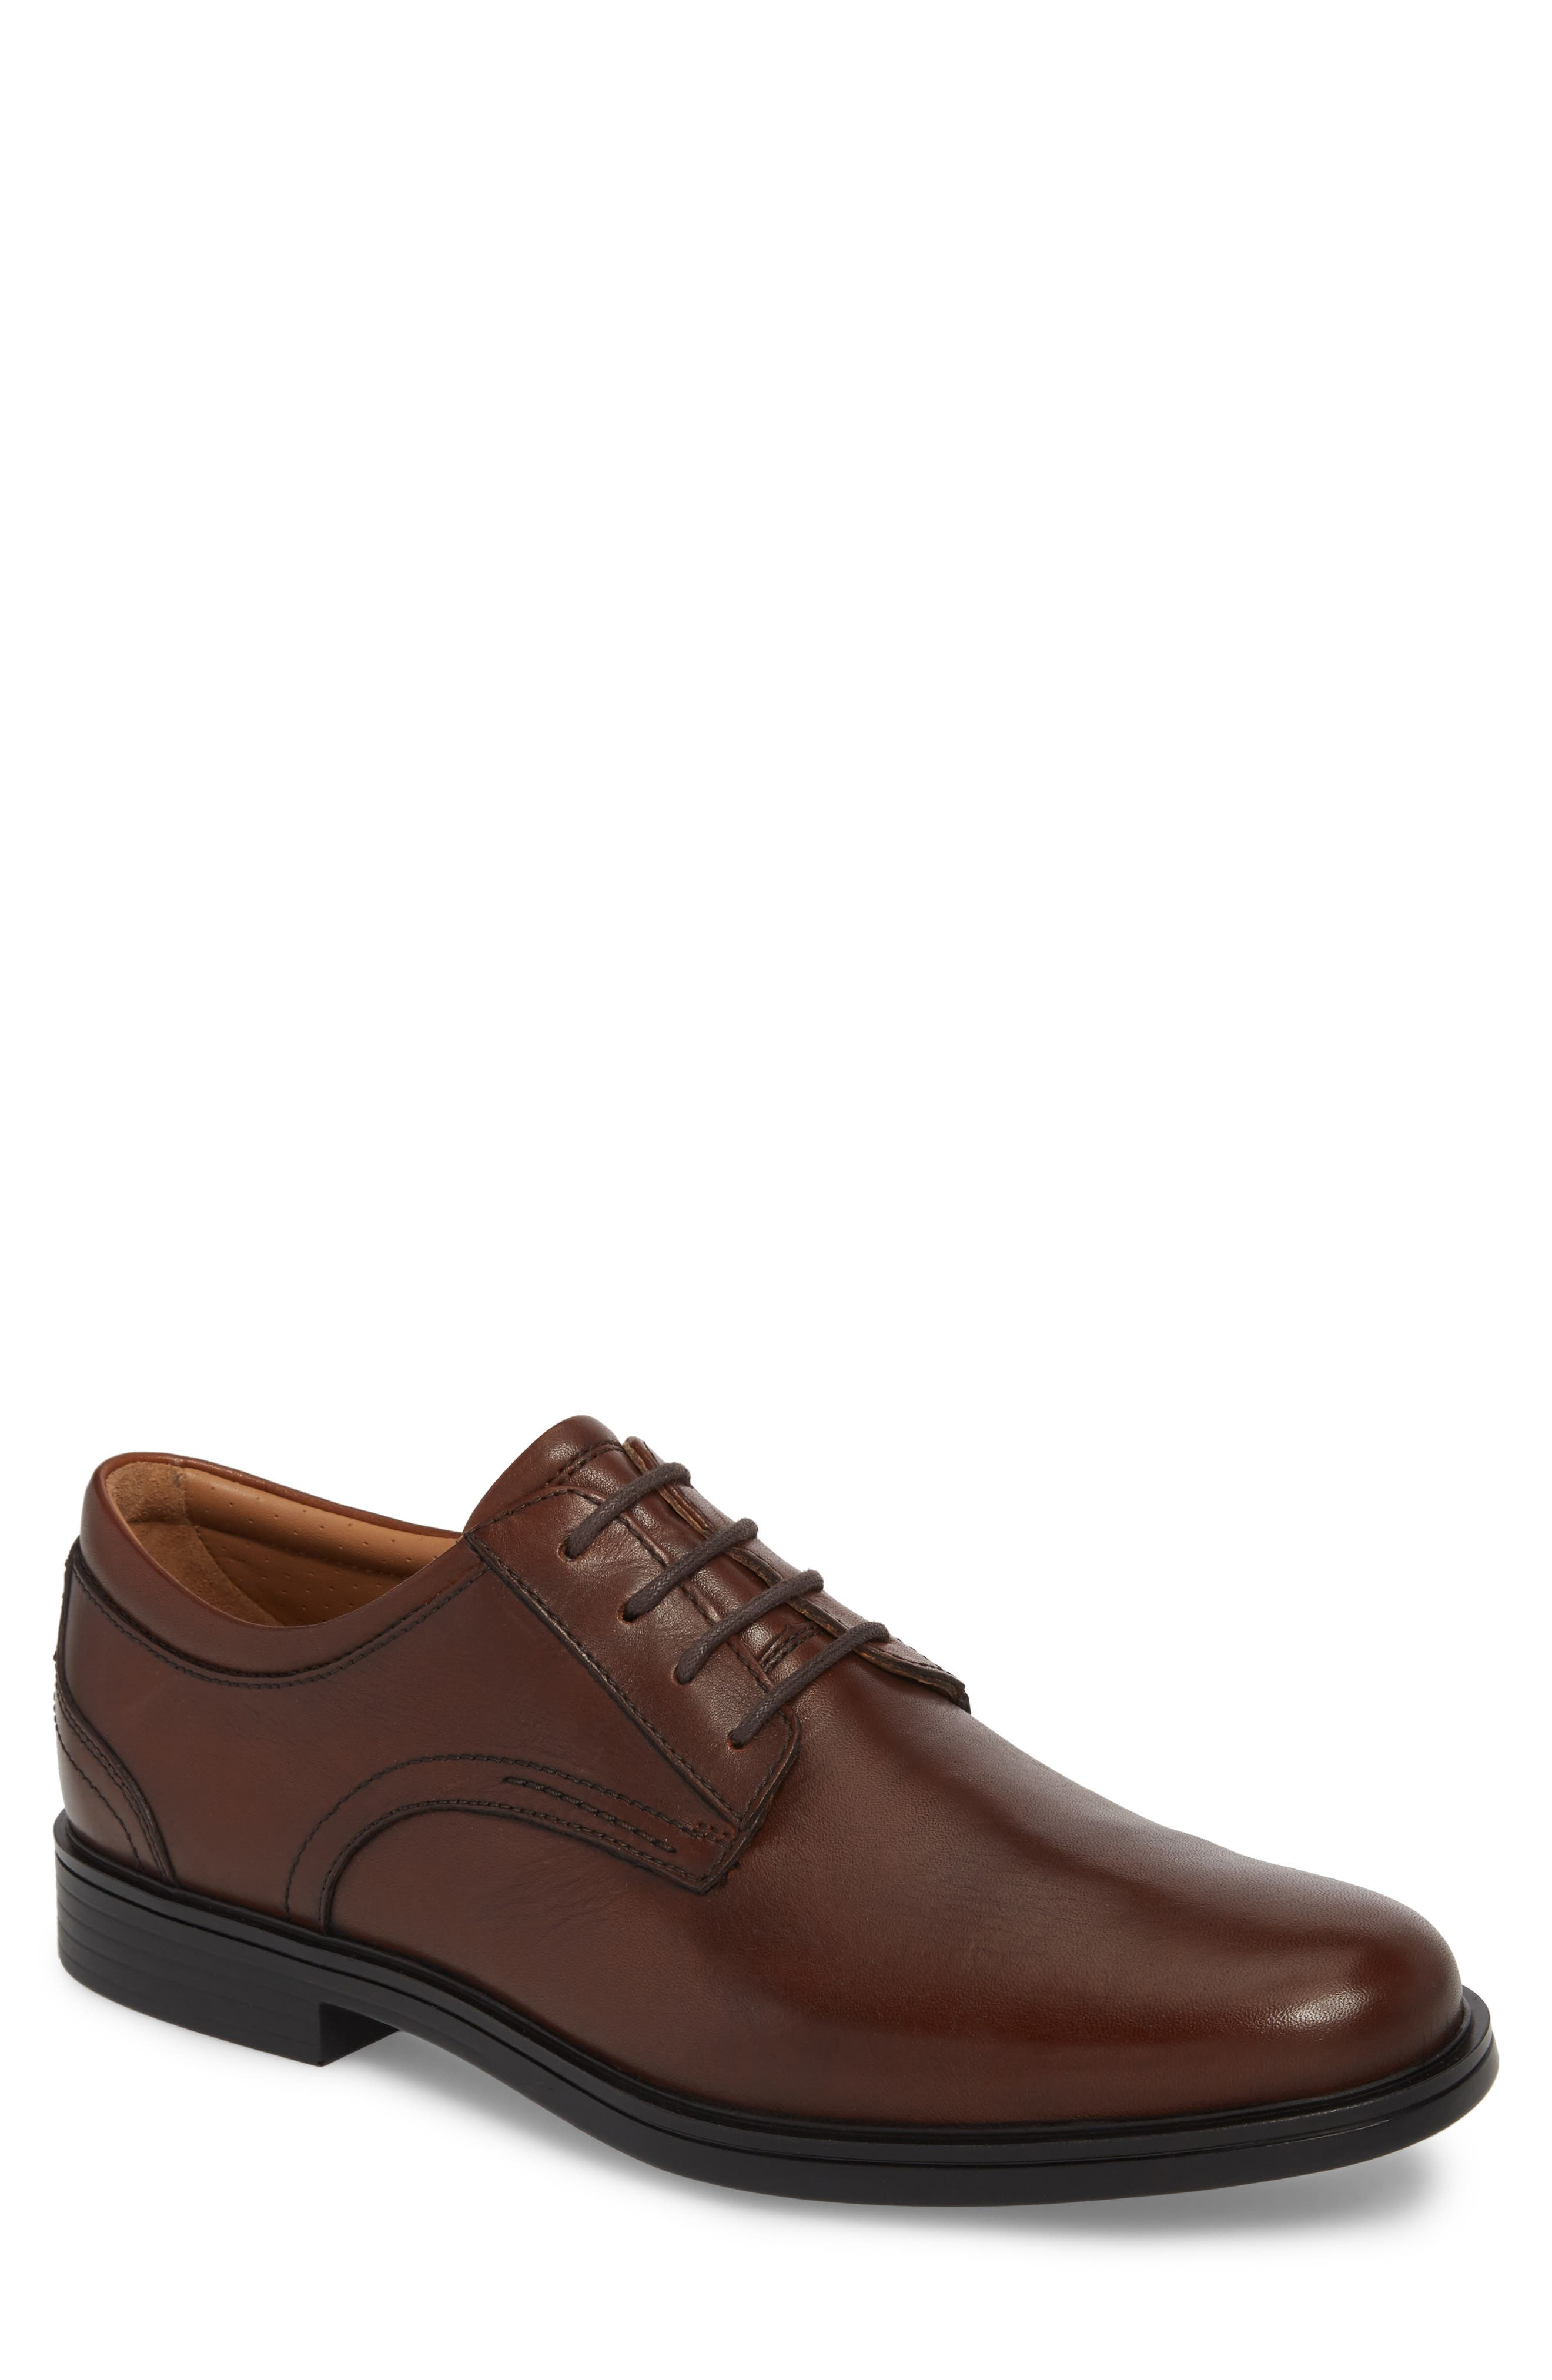 Unaldric Plain Toe Derby,                             Main thumbnail 1, color,                             Dark Tan Leather